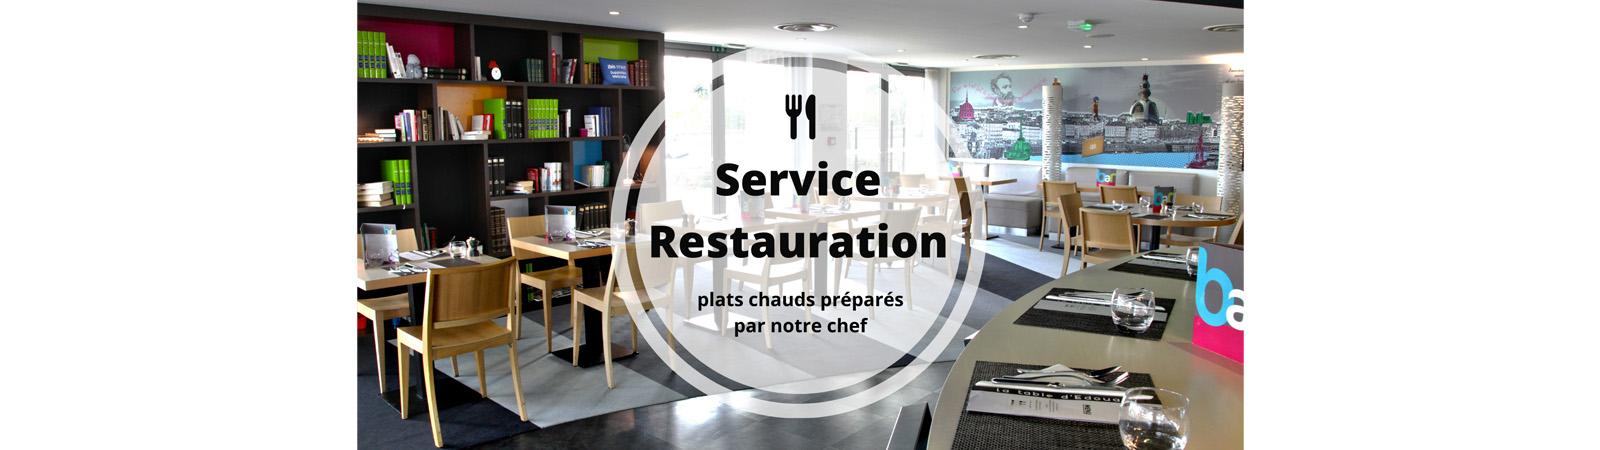 _0003_hotel-ibis-styles-nantes-reze-aeroport-restauration-diner